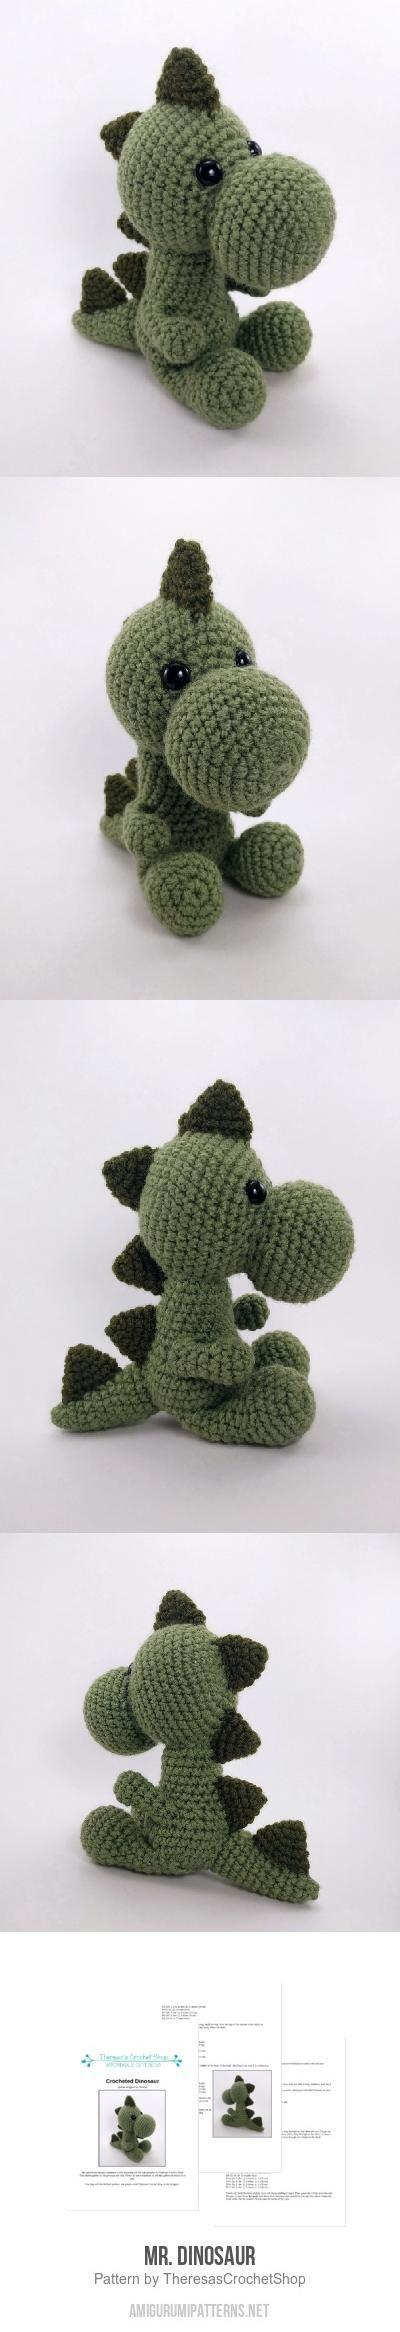 Mr. Dinosaur Amigurumi Pattern | amigurumi | Pinterest | Tejido ...